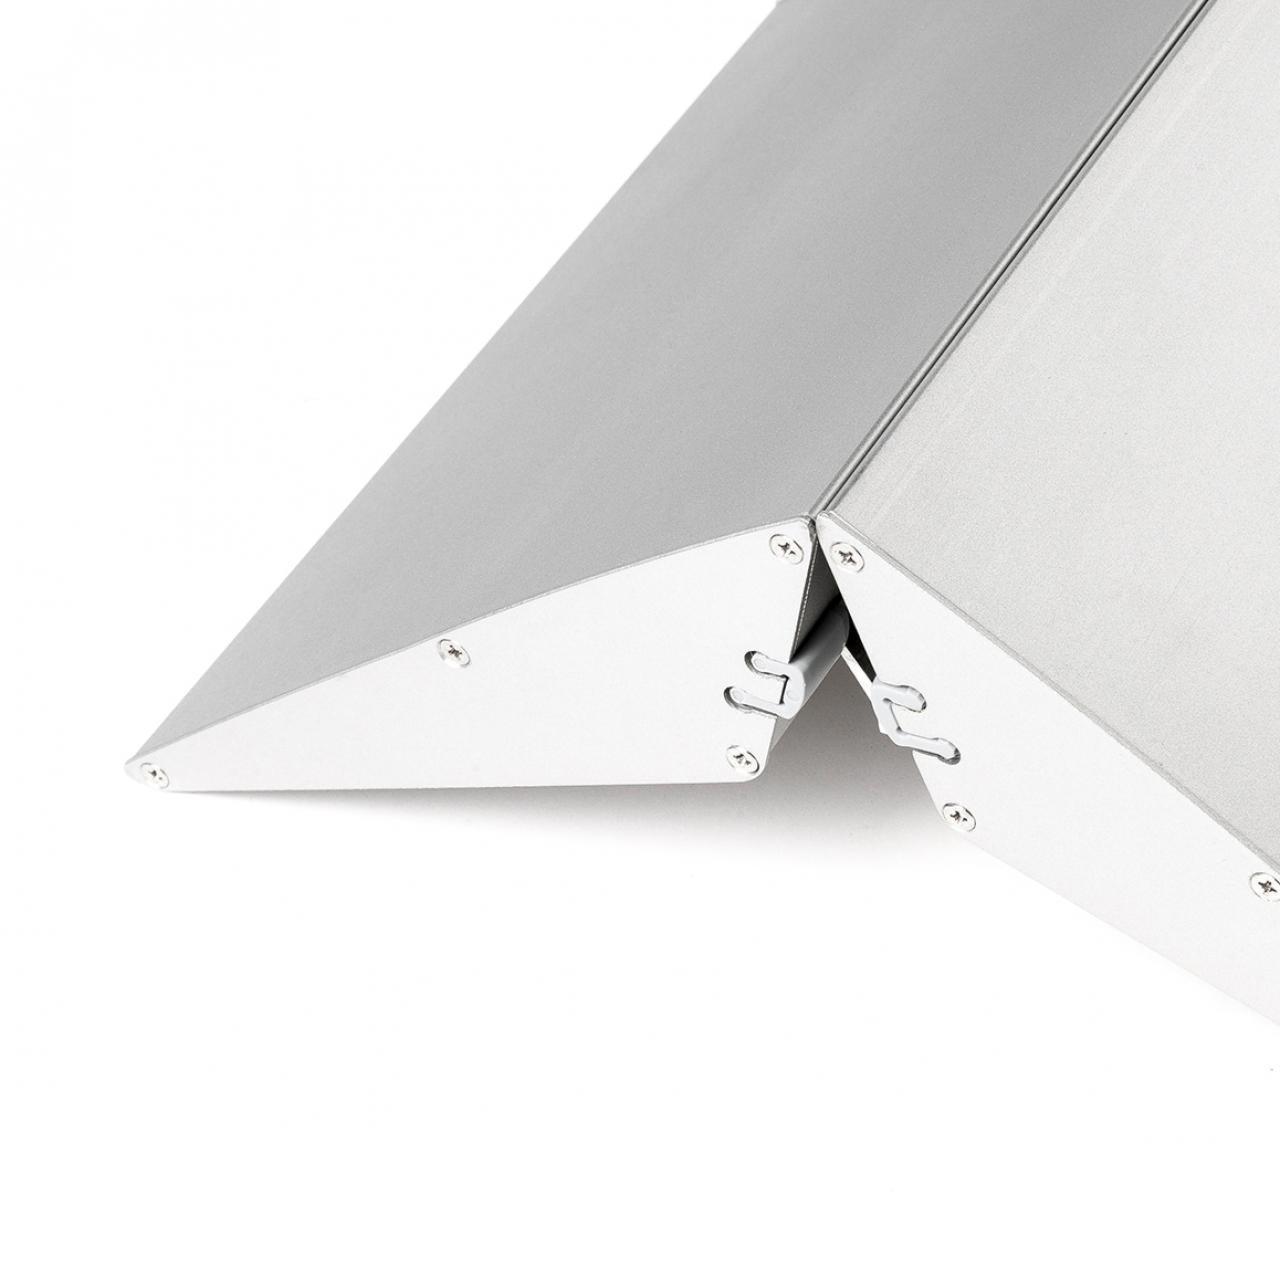 Aluminium-Standfuß silber für Acryl-Trennwand